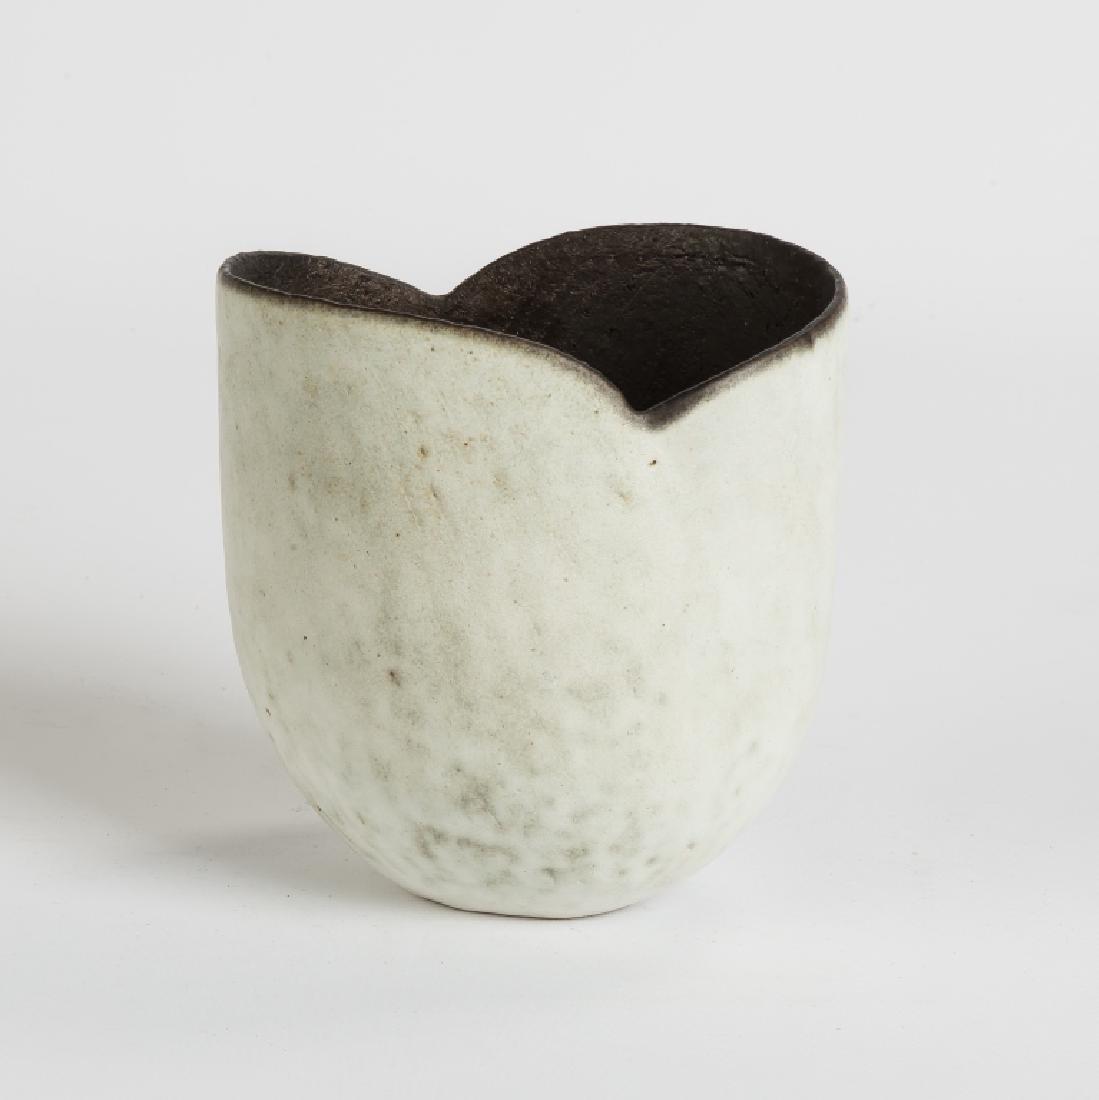 John Ward (English, born 1938) White Oval Pot with